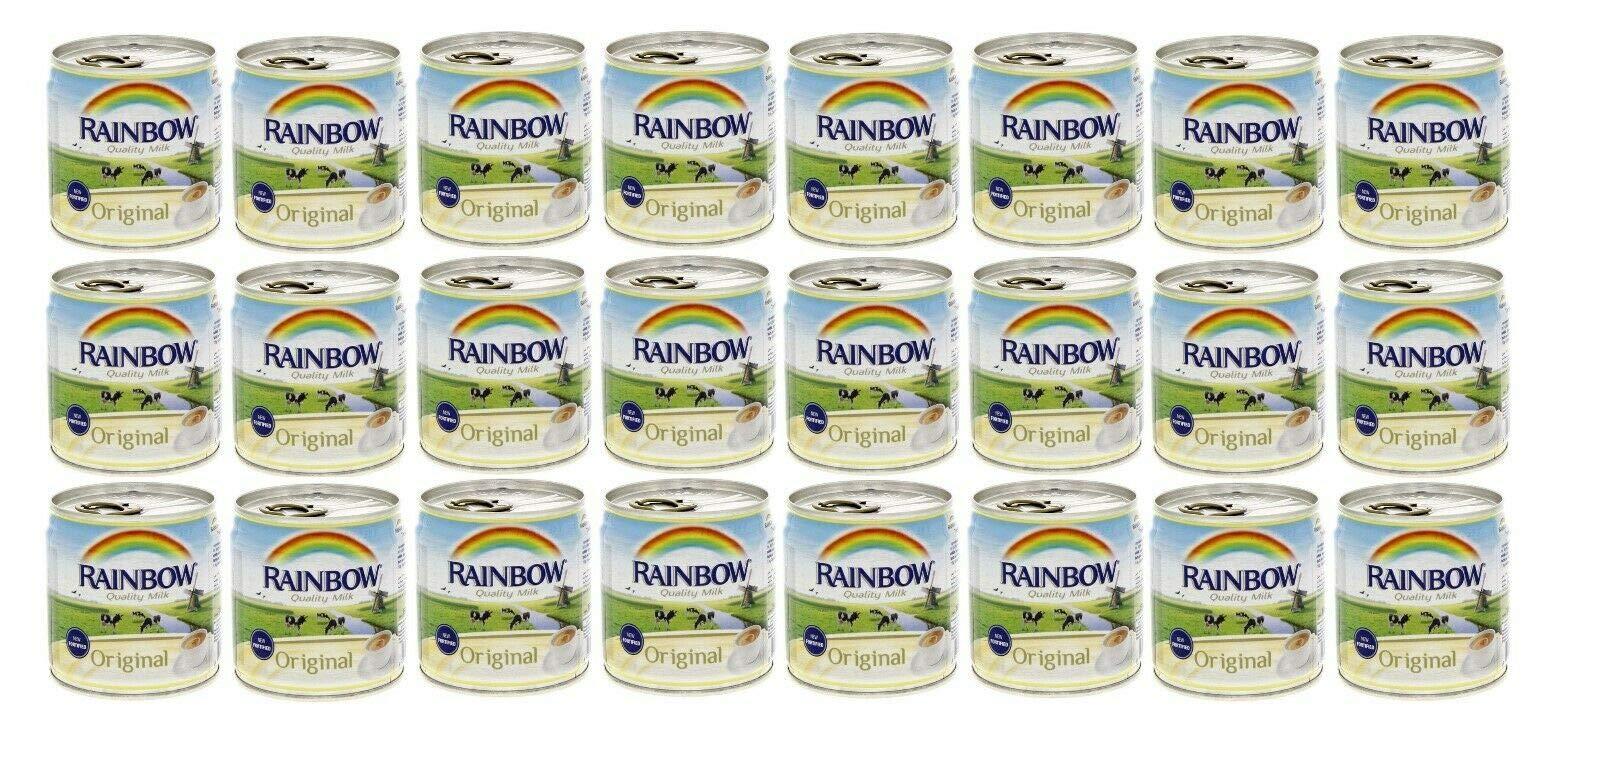 Rainbow Evaporated Milk Full Cream Sterilized 6oz. 170gm each 24 Cans حليب أبو قوس مبخر كامل الدسم افضل صديق للشاي by Al Amin